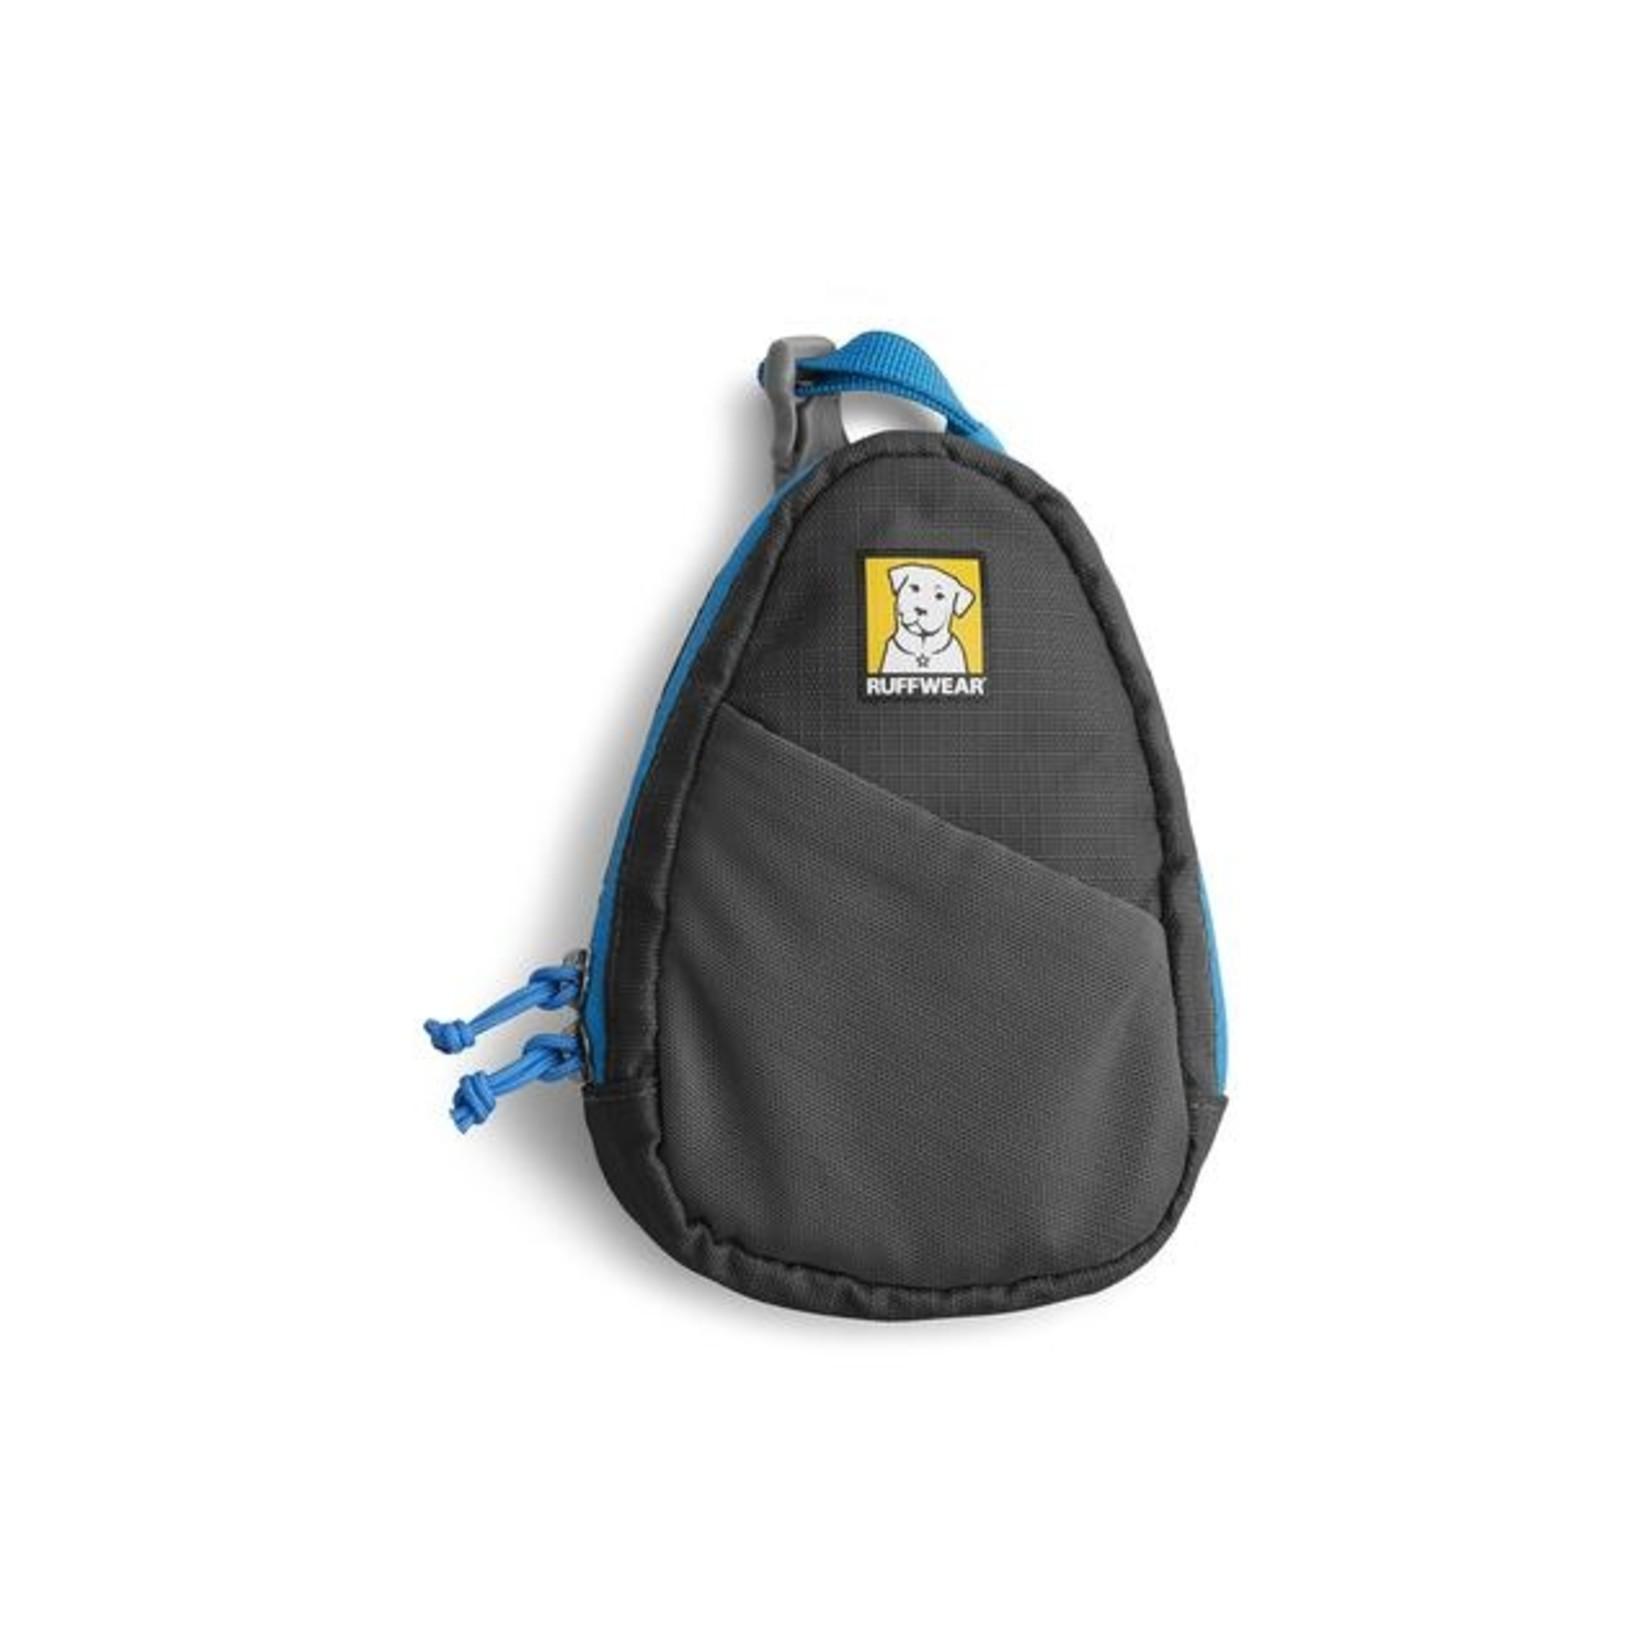 Ruffwear RUFFWEAR Stash Bag Twilight Gray